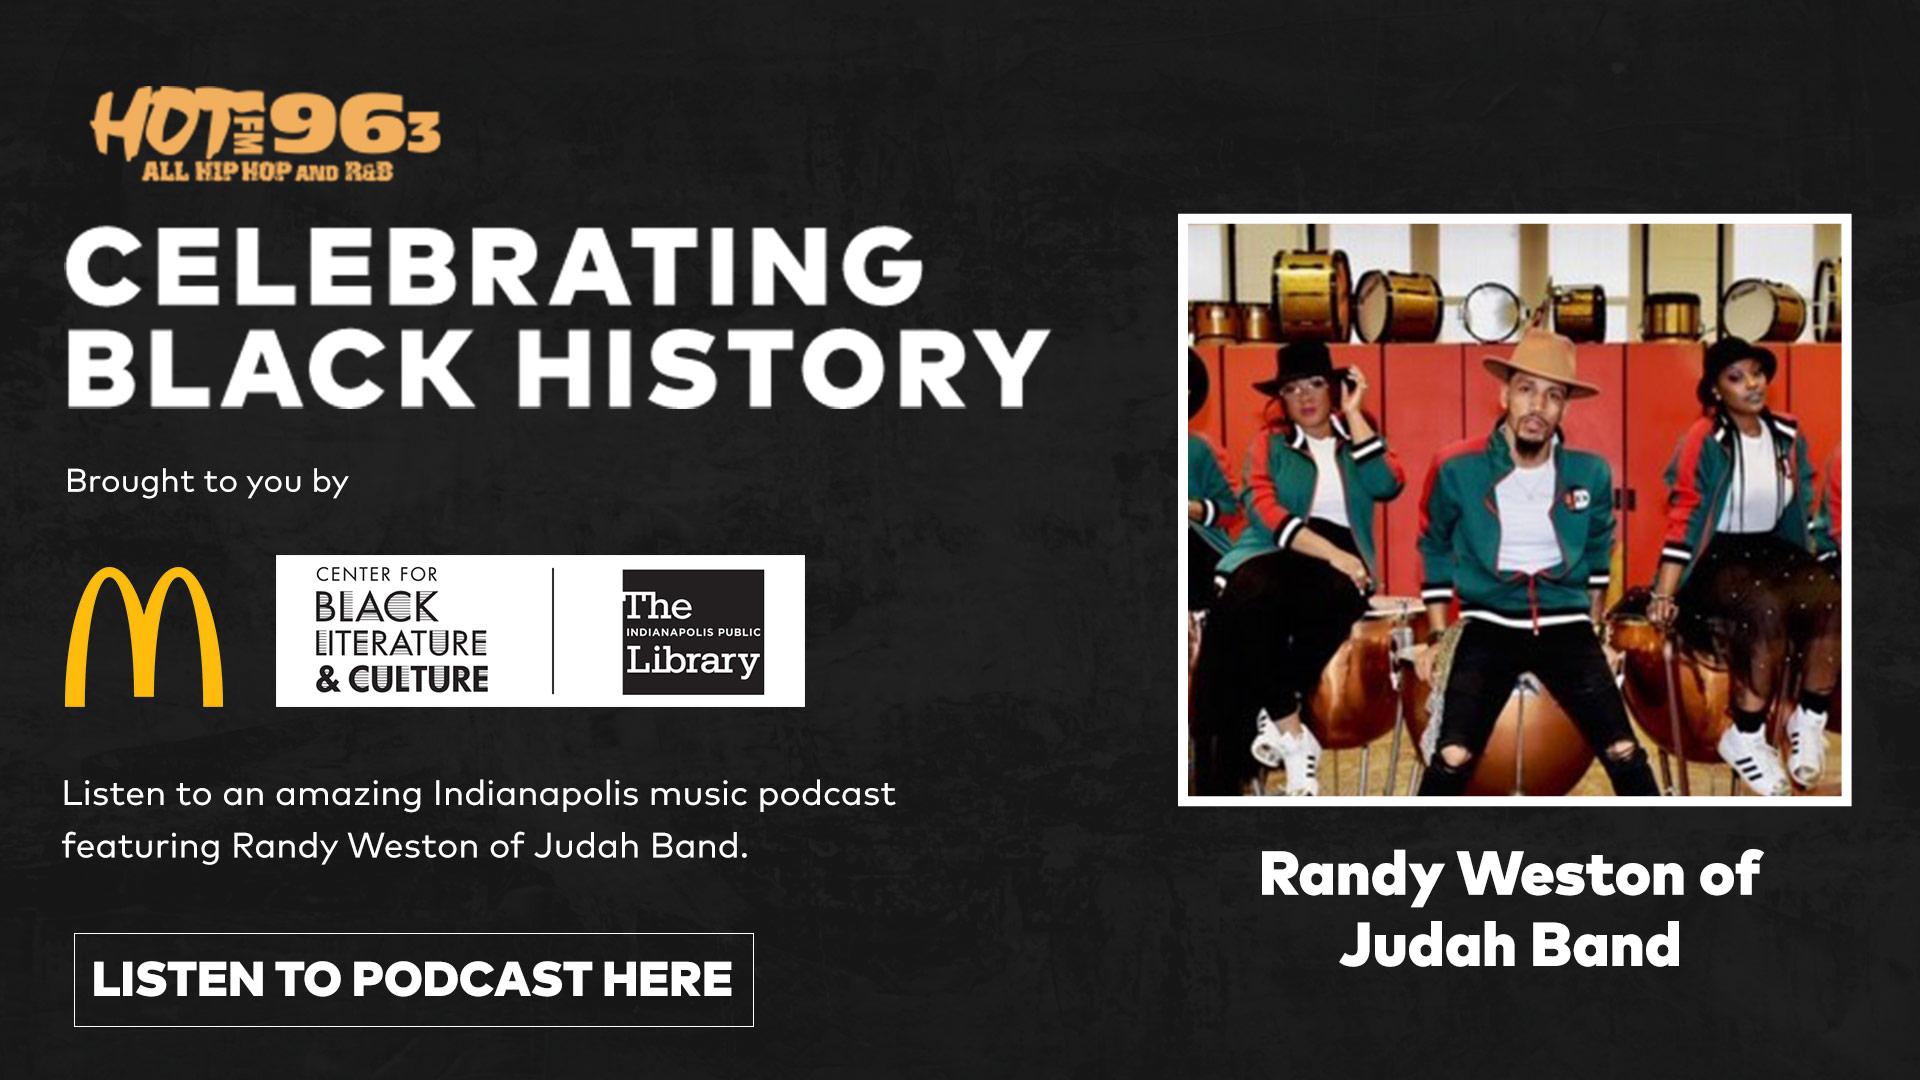 McDonald's Black History Month Podcast: Randy Weston